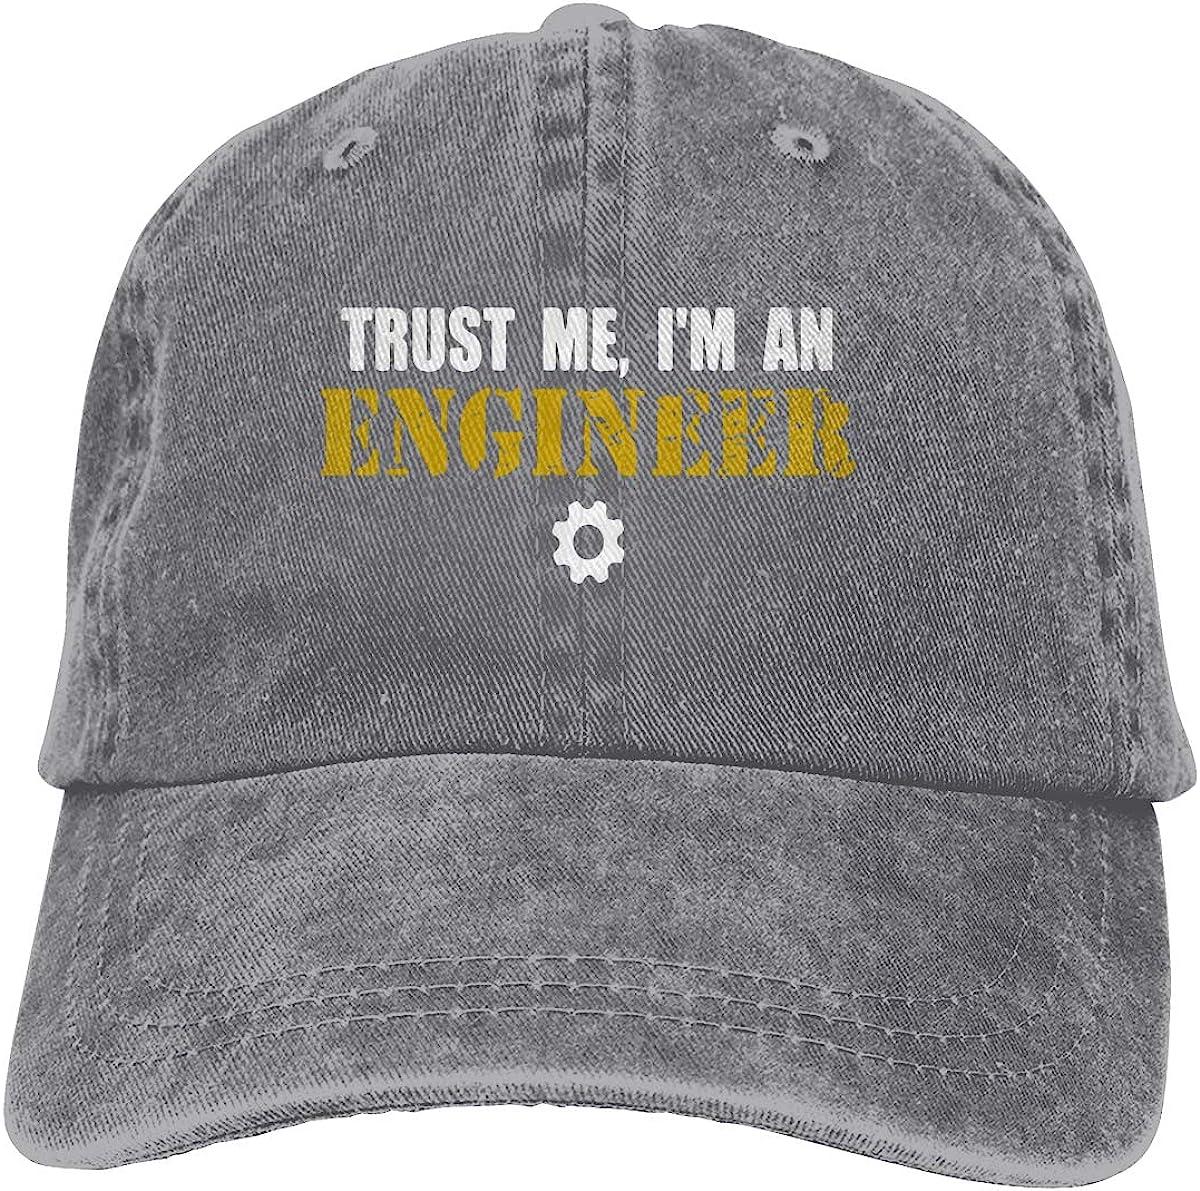 Trust Me Im an Engineer1 Unisex Personalize Cowboy Casquette Adjustable Baseball Cap